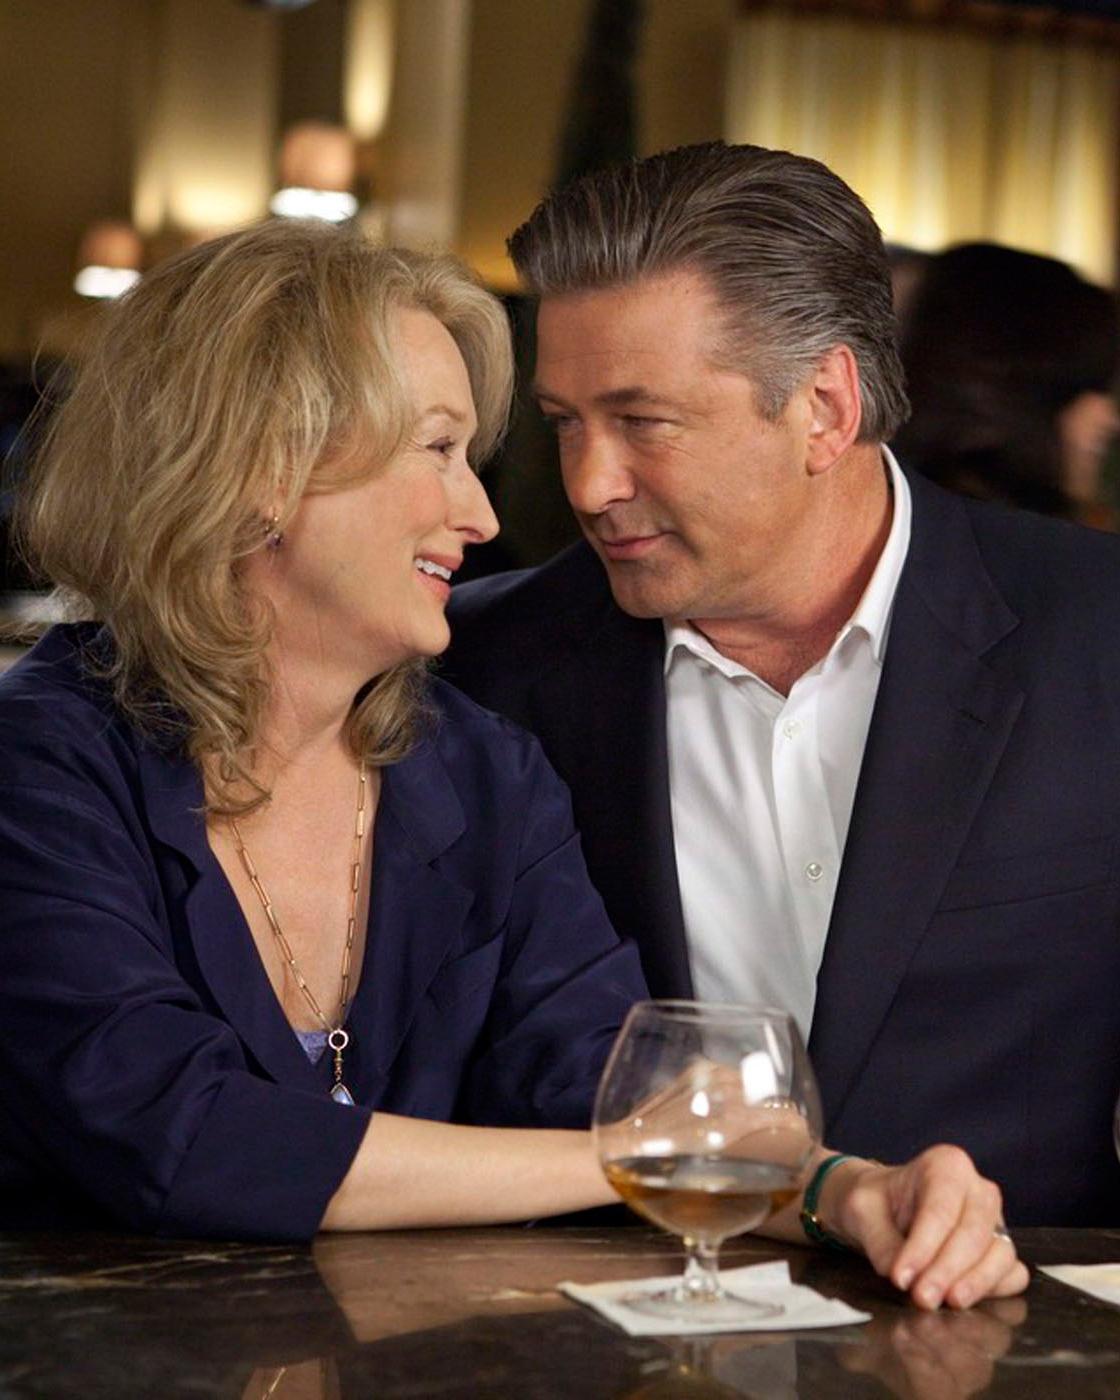 its-complicated-movie-scene-meryl-streep-alec-baldwin-drinking-wine-0116.jpg